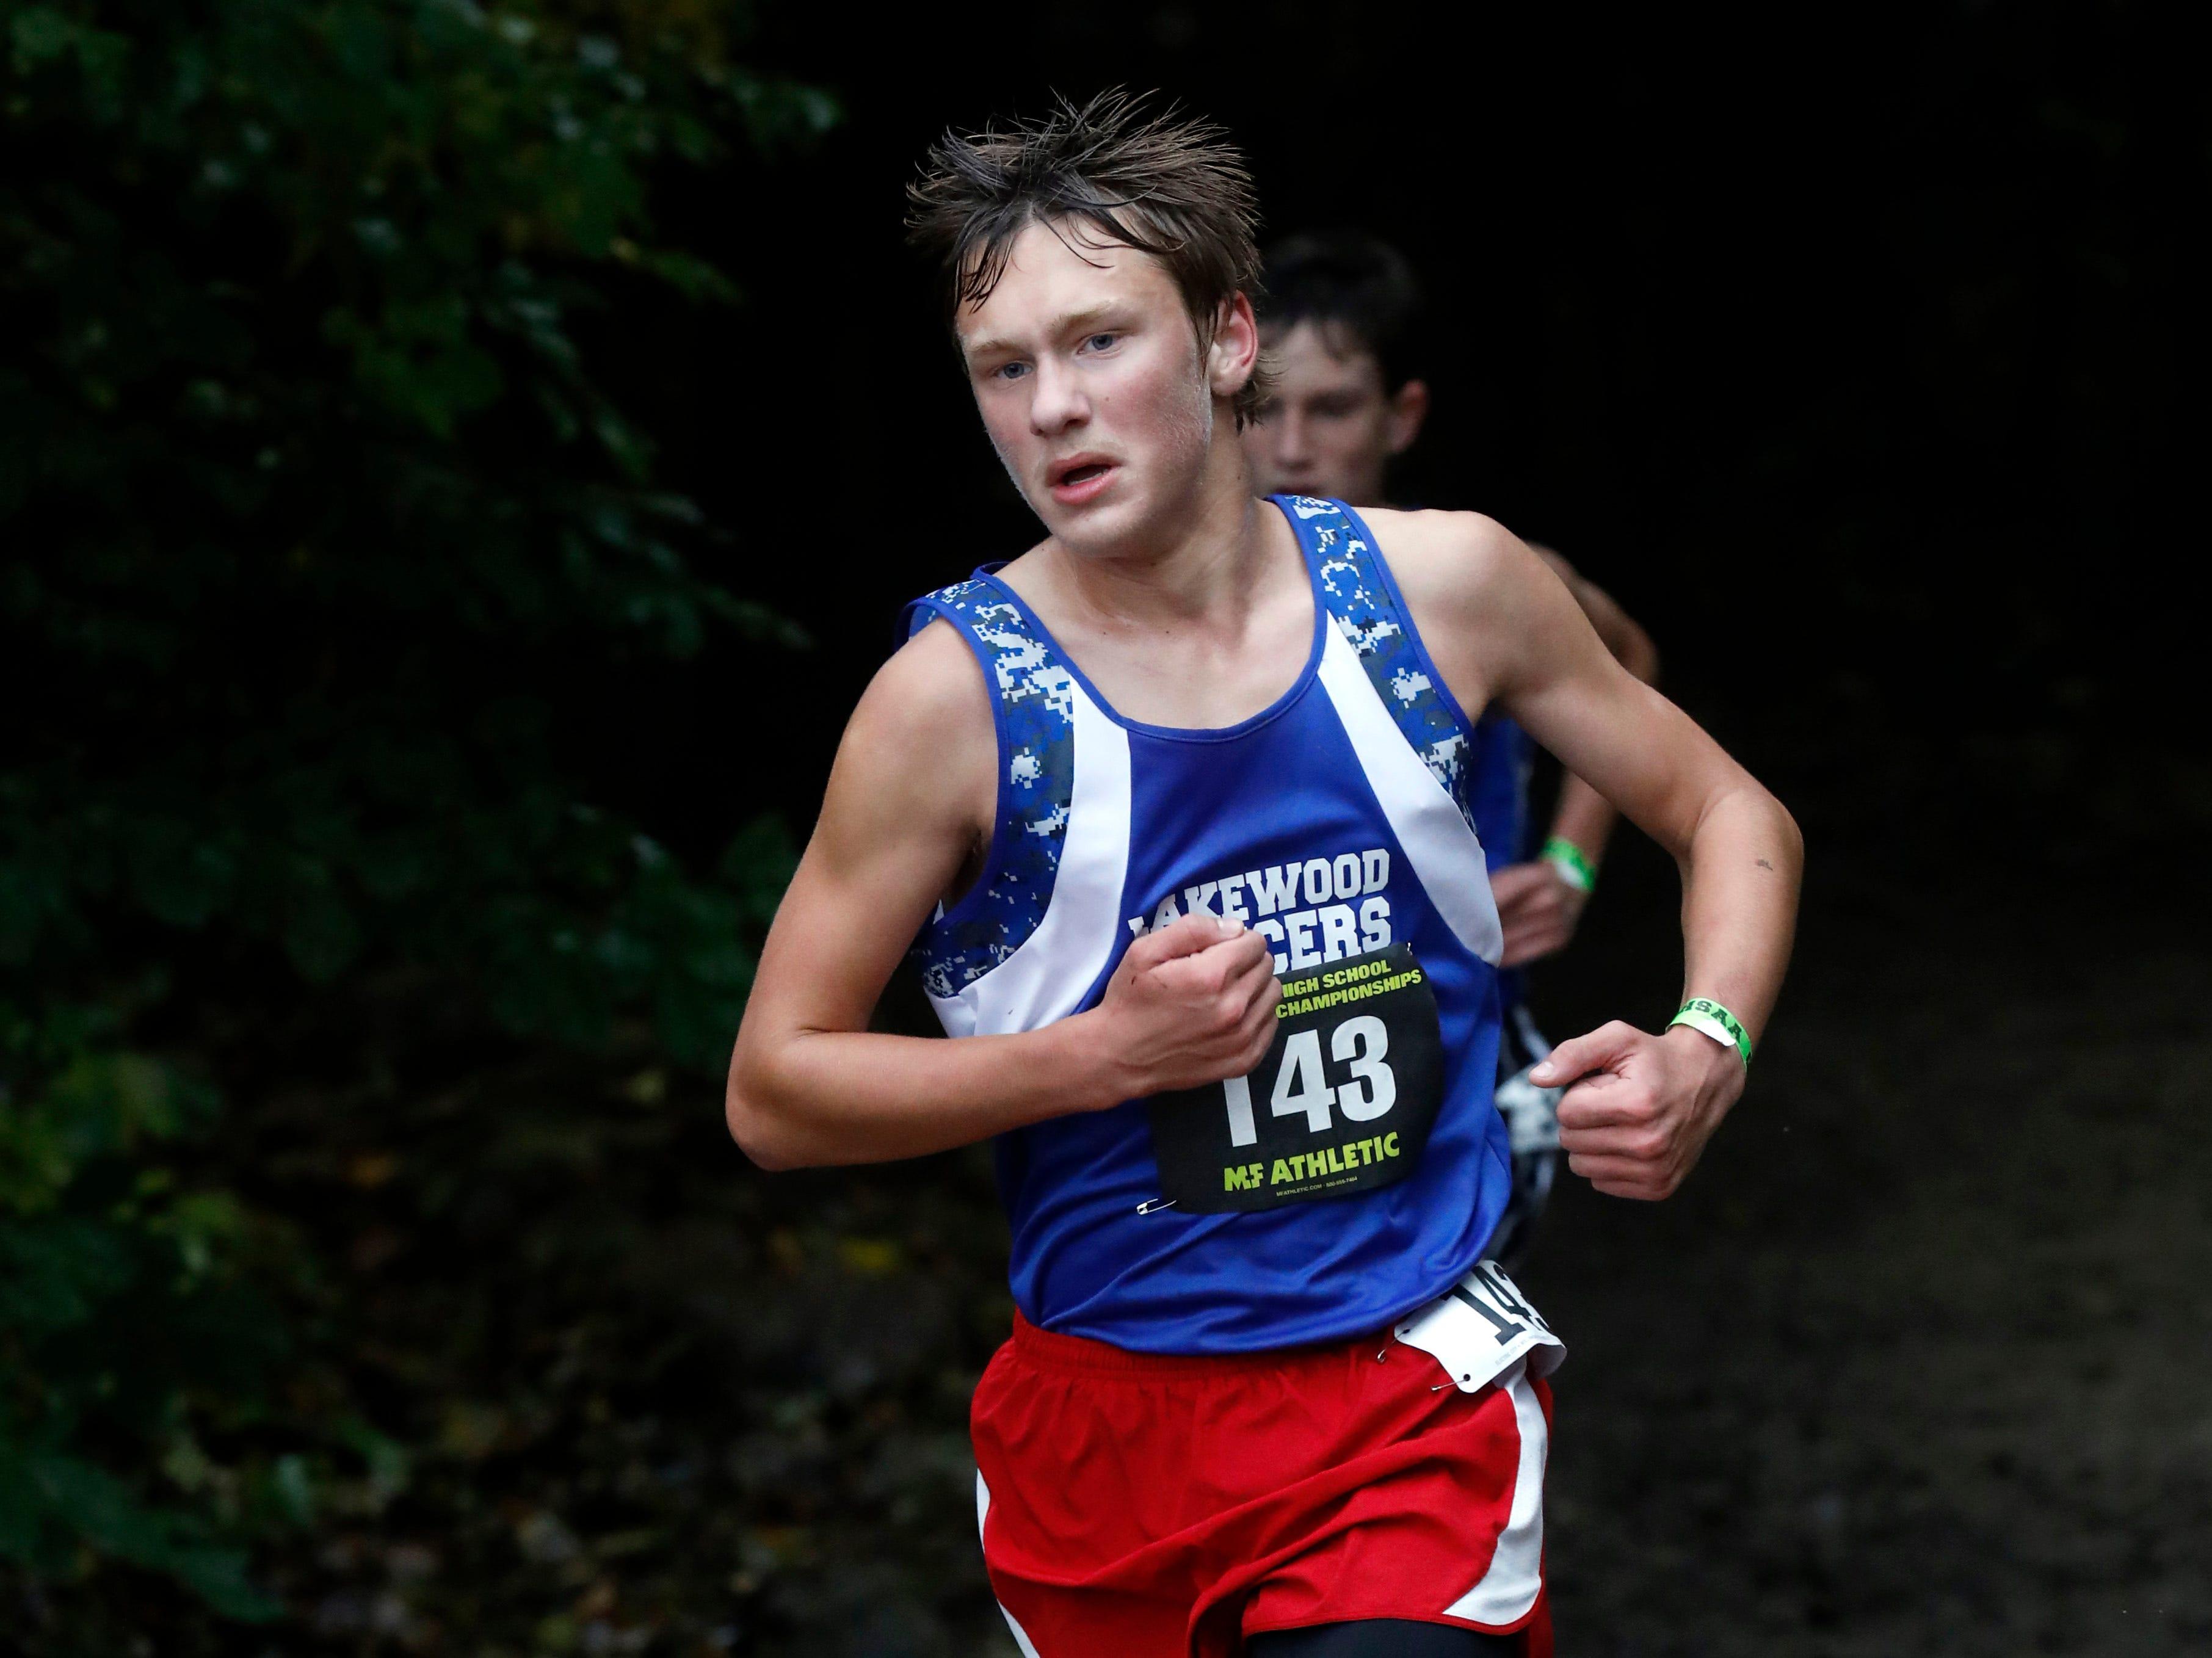 Lakewood's Mason Pound runs in the Regional Cross Country meet Saturday, Oct. 27, 2018, at Pickerington North High School in Pickerington.